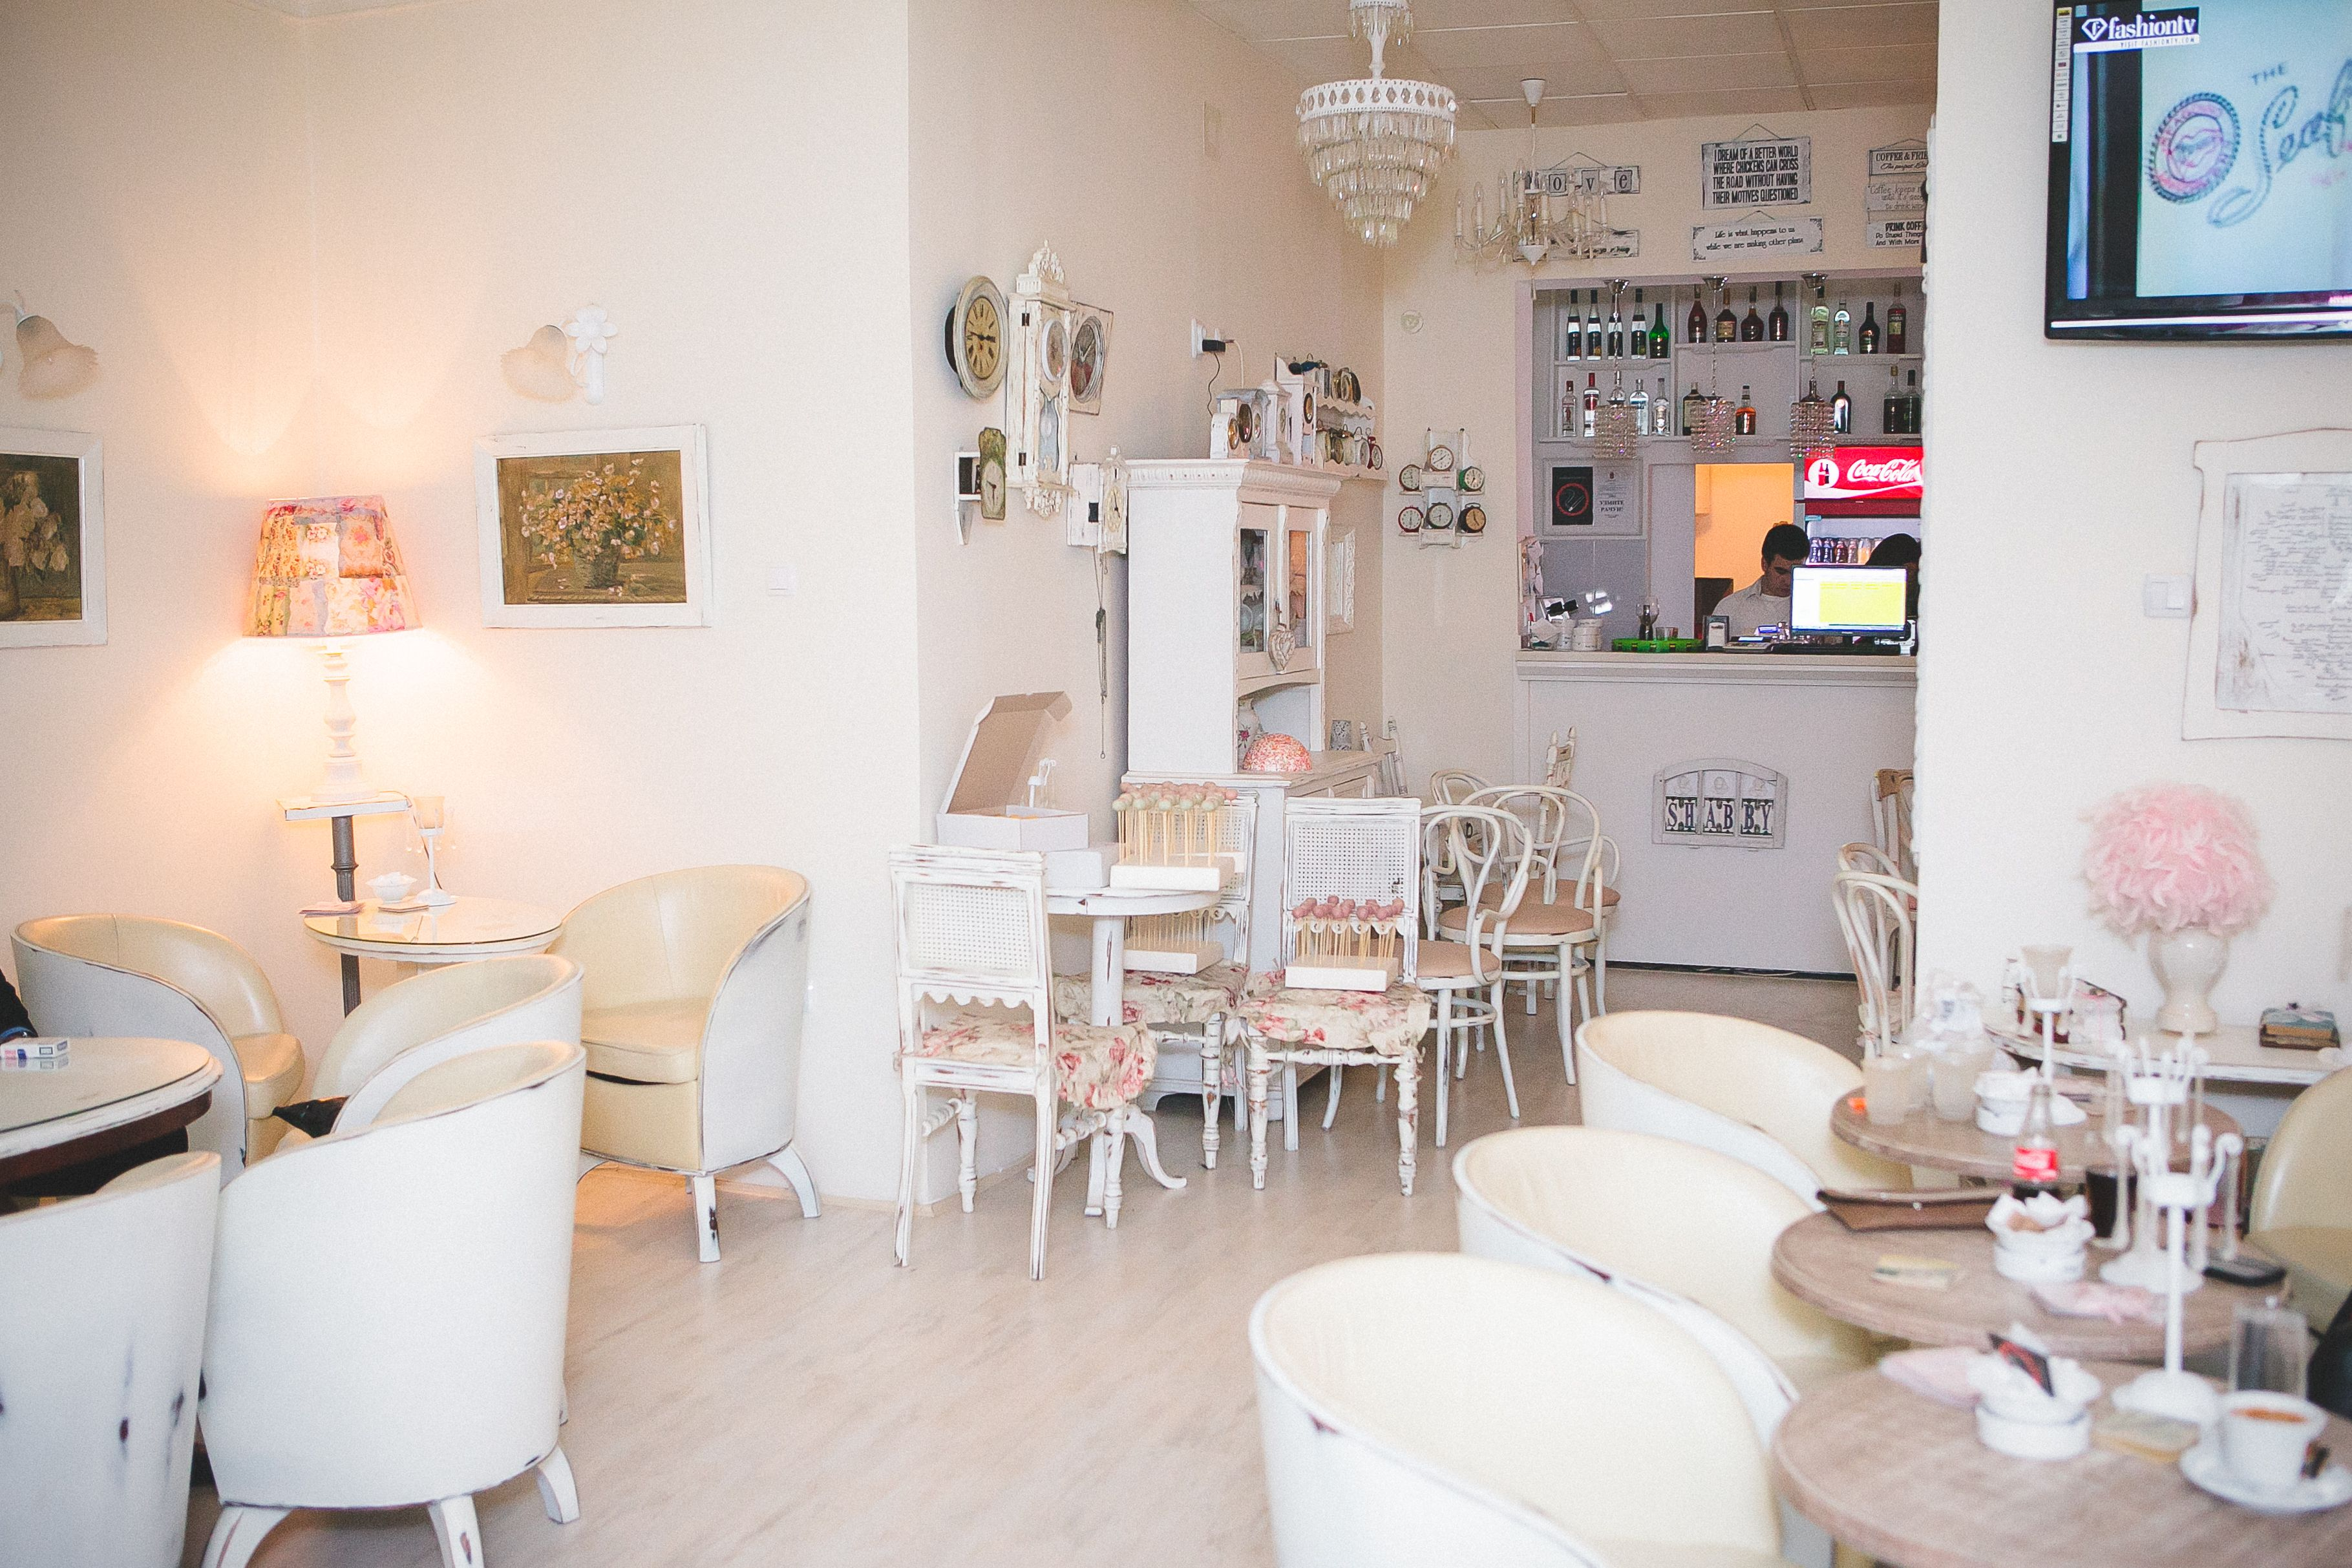 Shabby Chic Cafe Belgrade